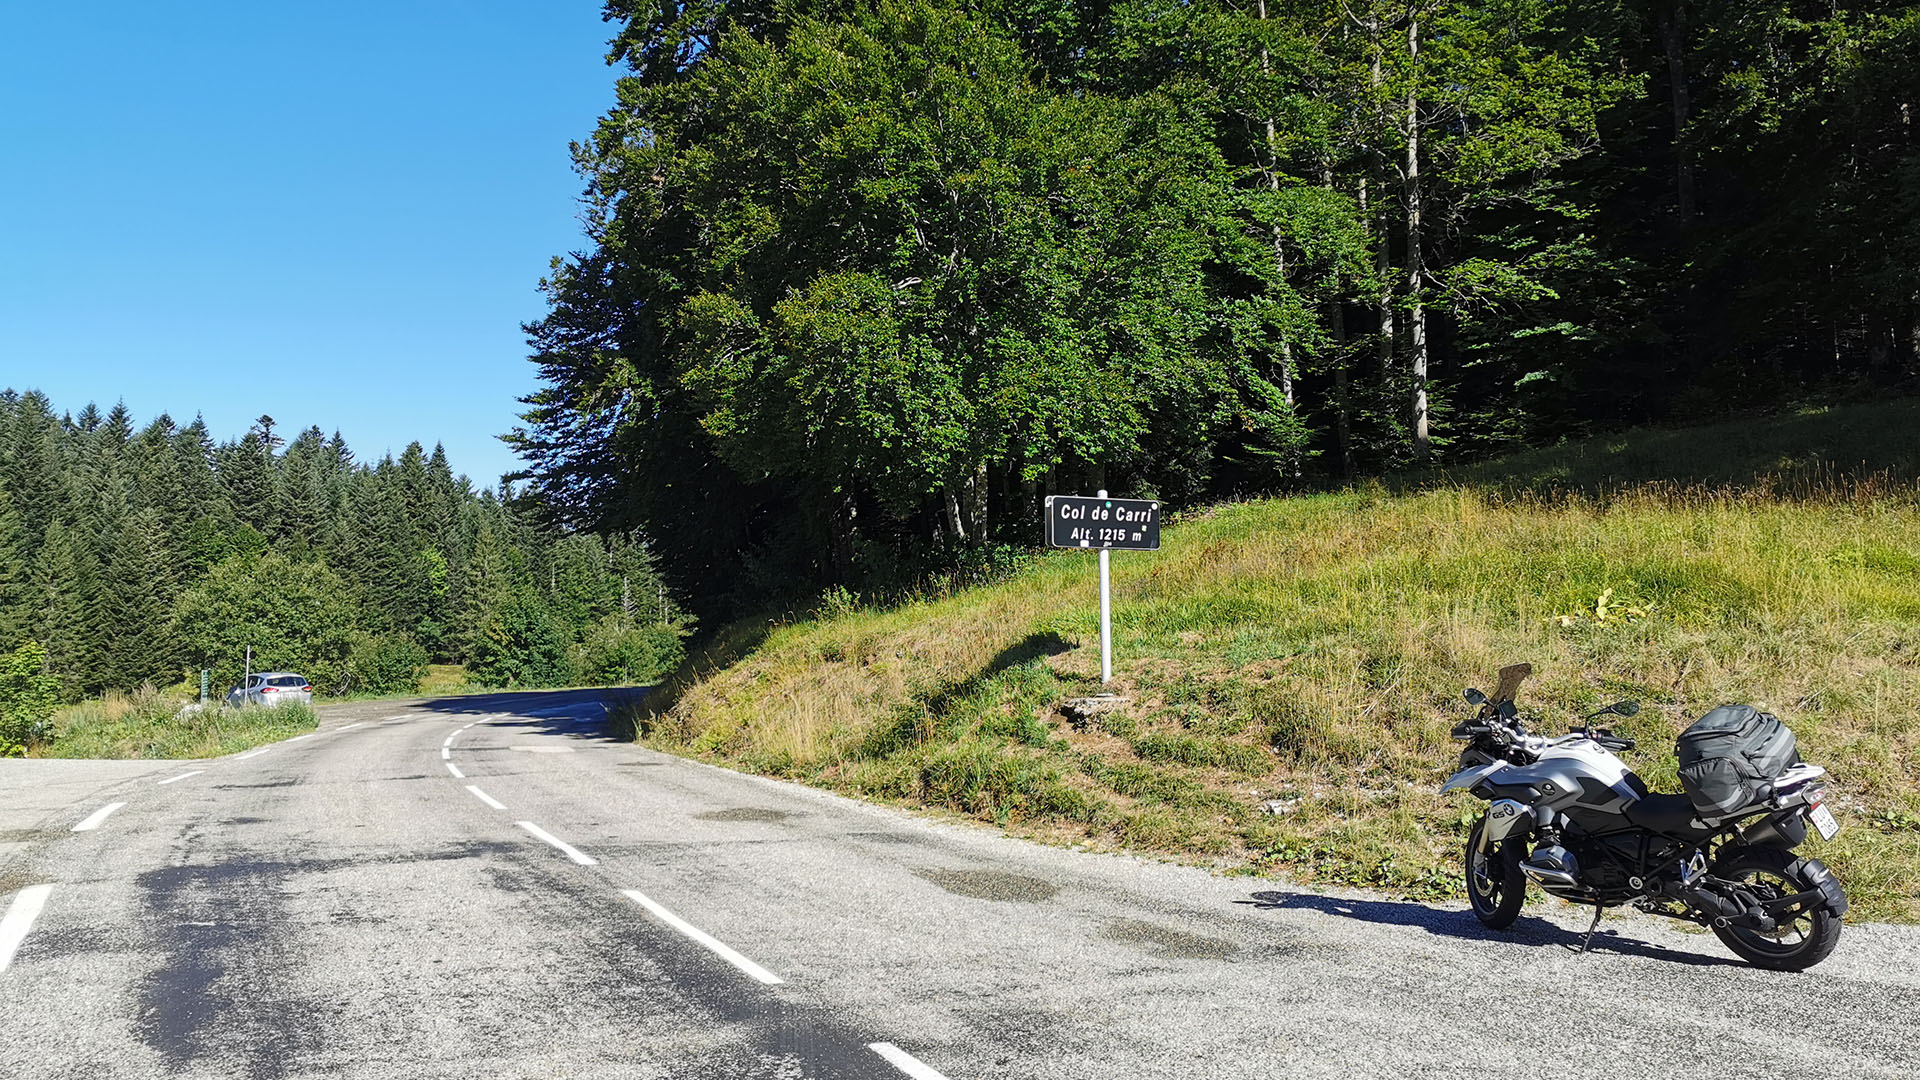 1215 - F - Col de Carri